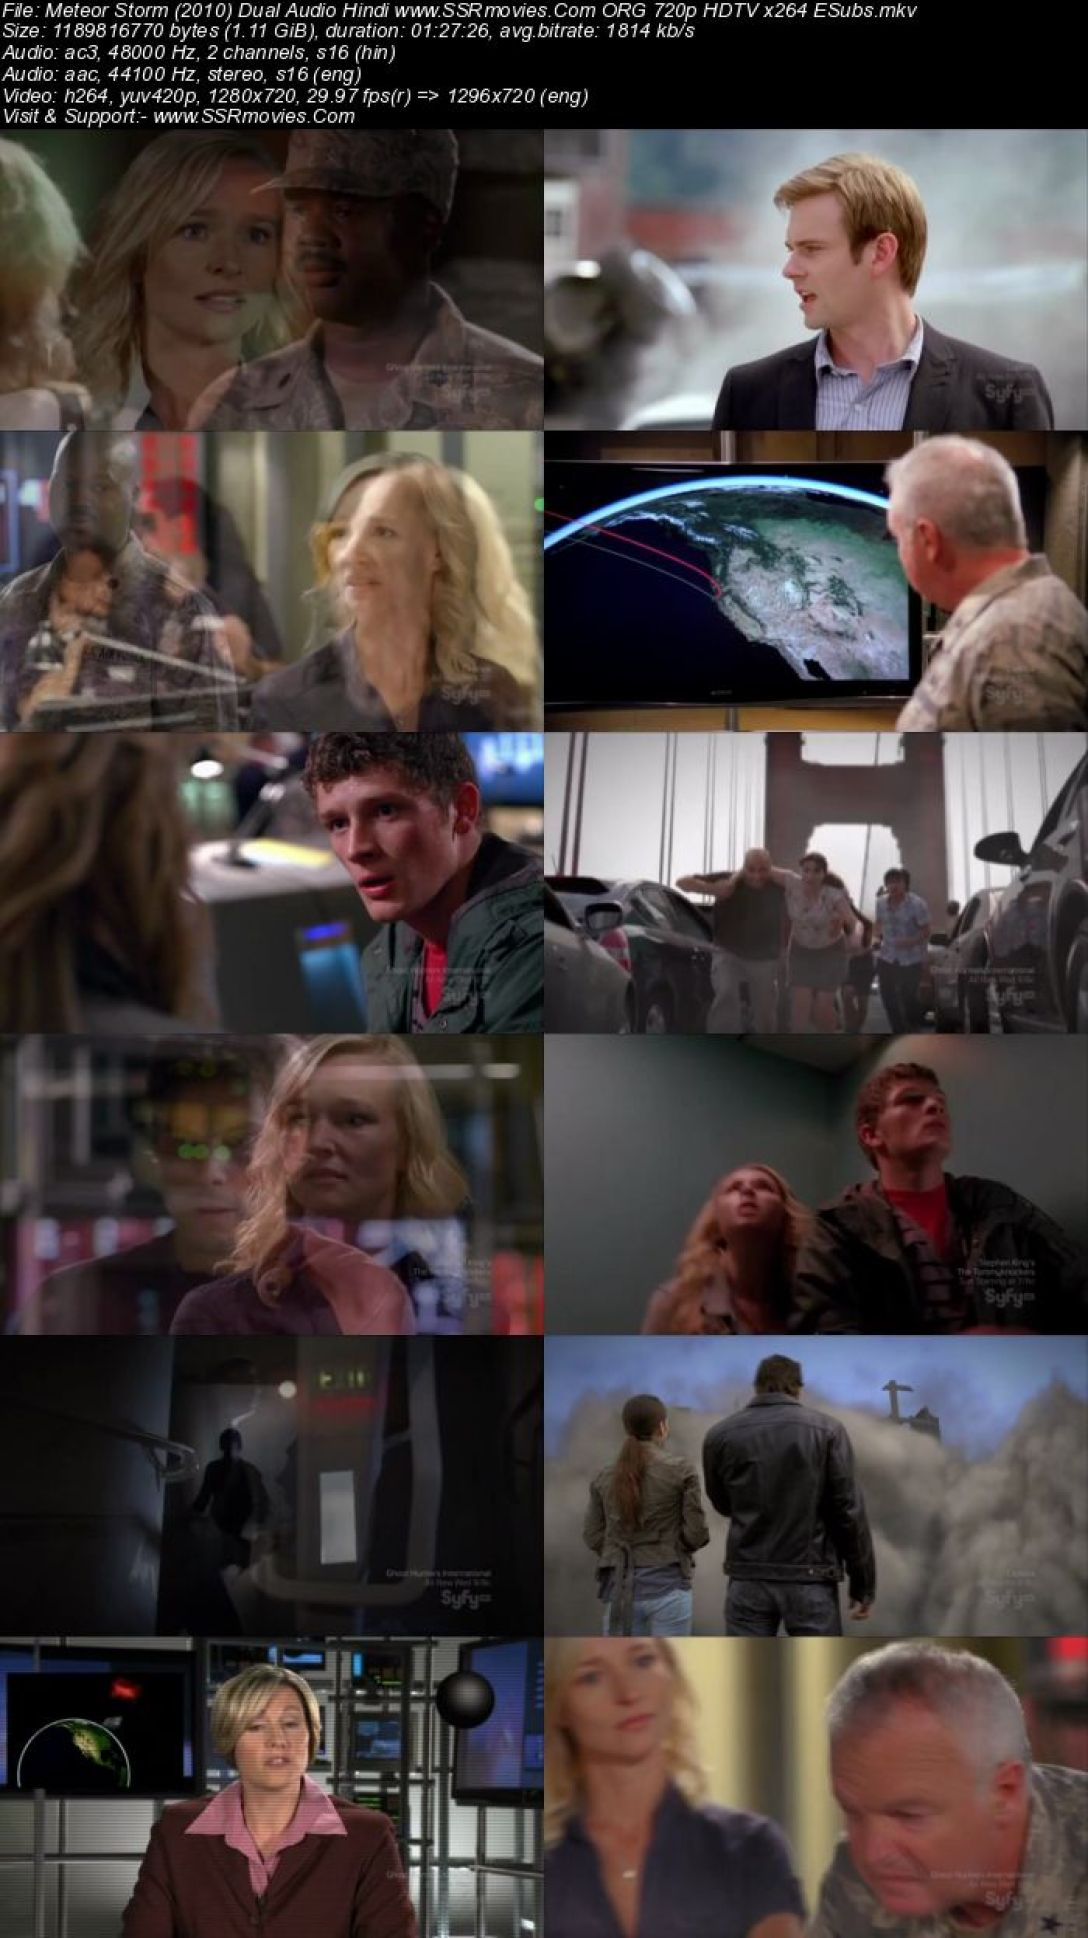 Meteor Storm (2010) Dual Audio Hindi 720p HDTV x264 1.1GB Full Movie Download